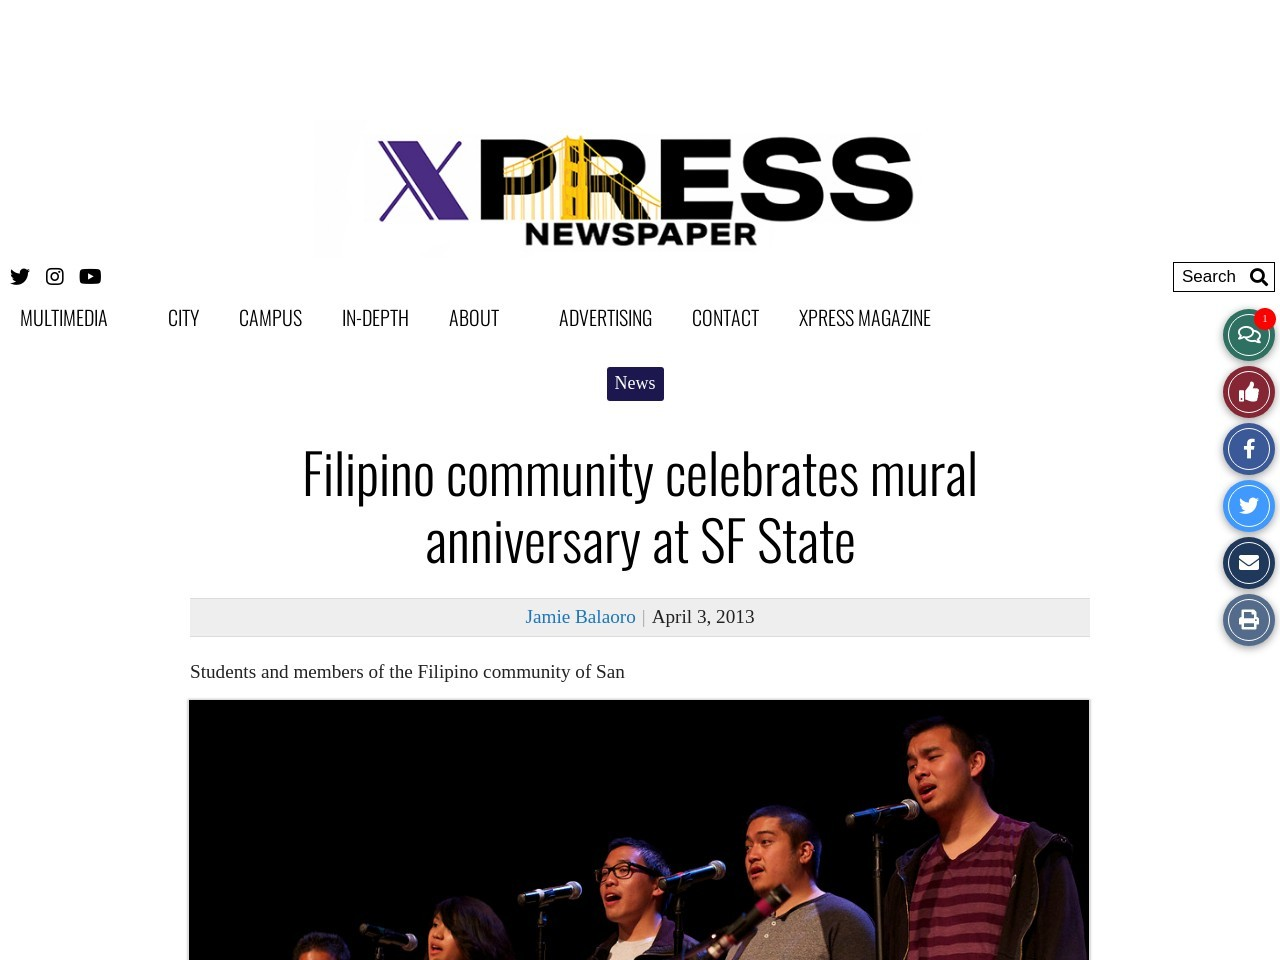 Filipino community celebrates mural anniversary at SF State